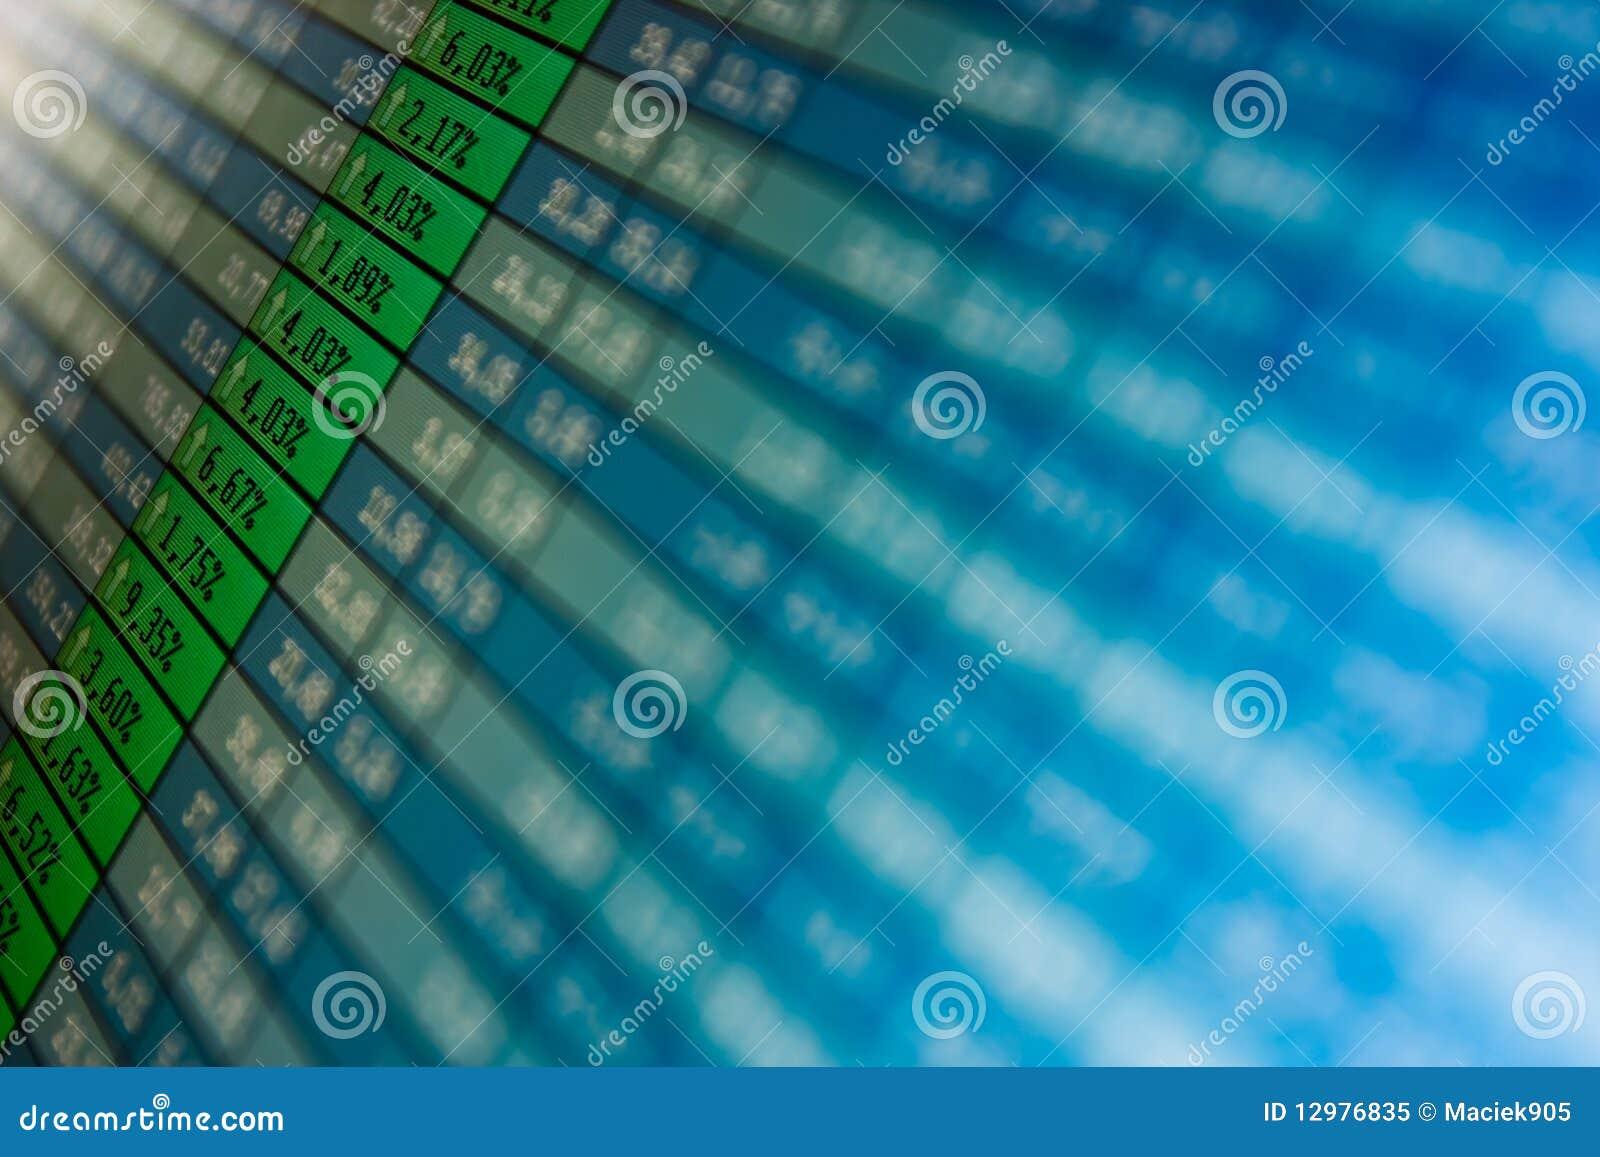 Real Time Stock Quote Real Time Stock Quotes Free  New York Forex